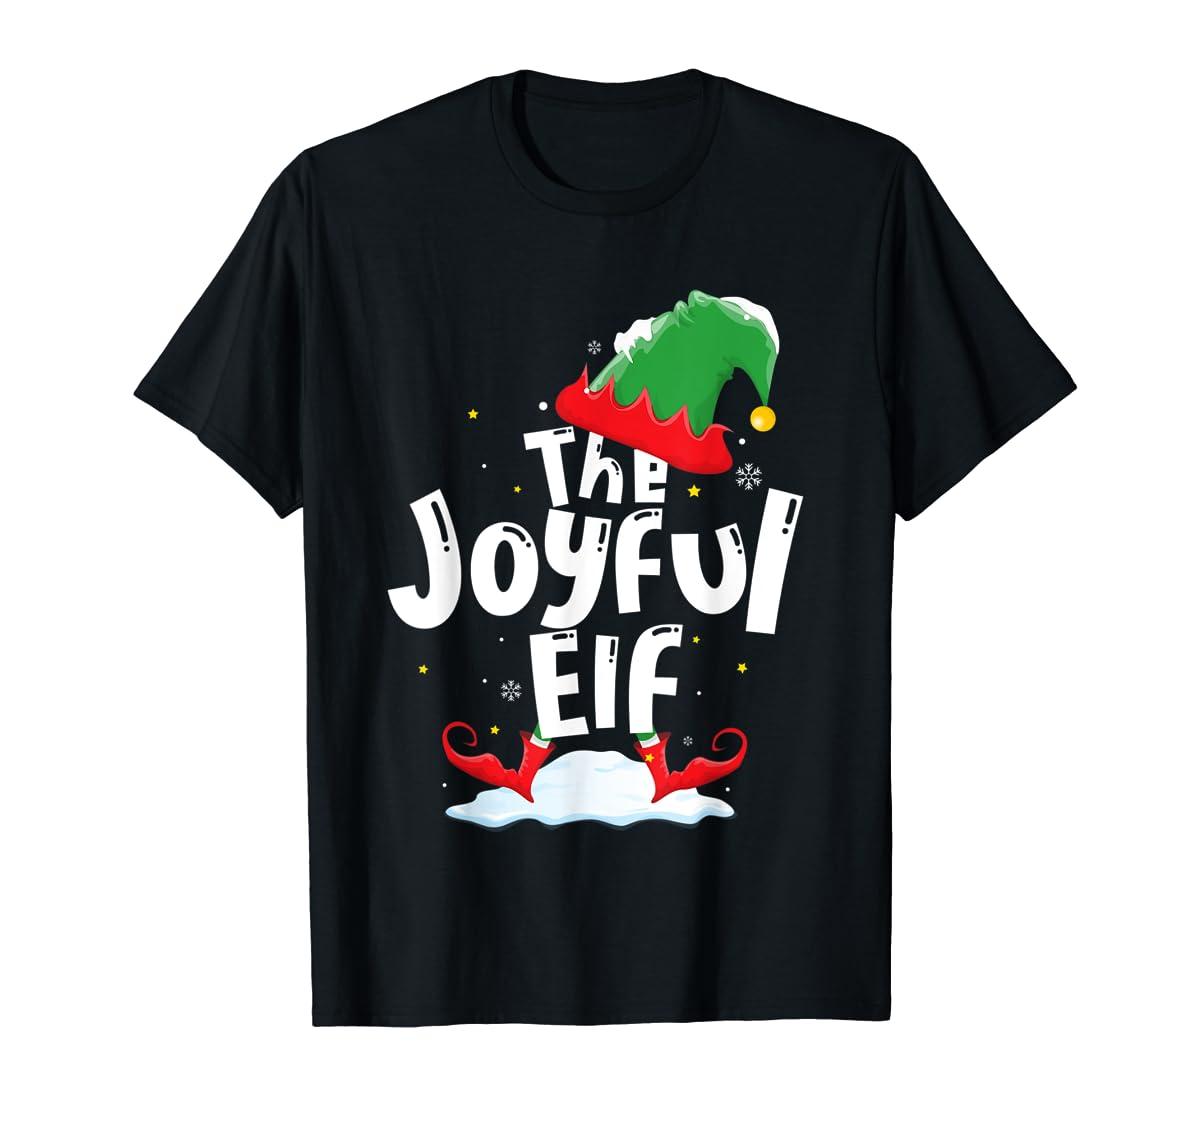 The Joyful Elf Group Matching Family Christmas Gifts Holiday T-Shirt-Men's T-Shirt-Black